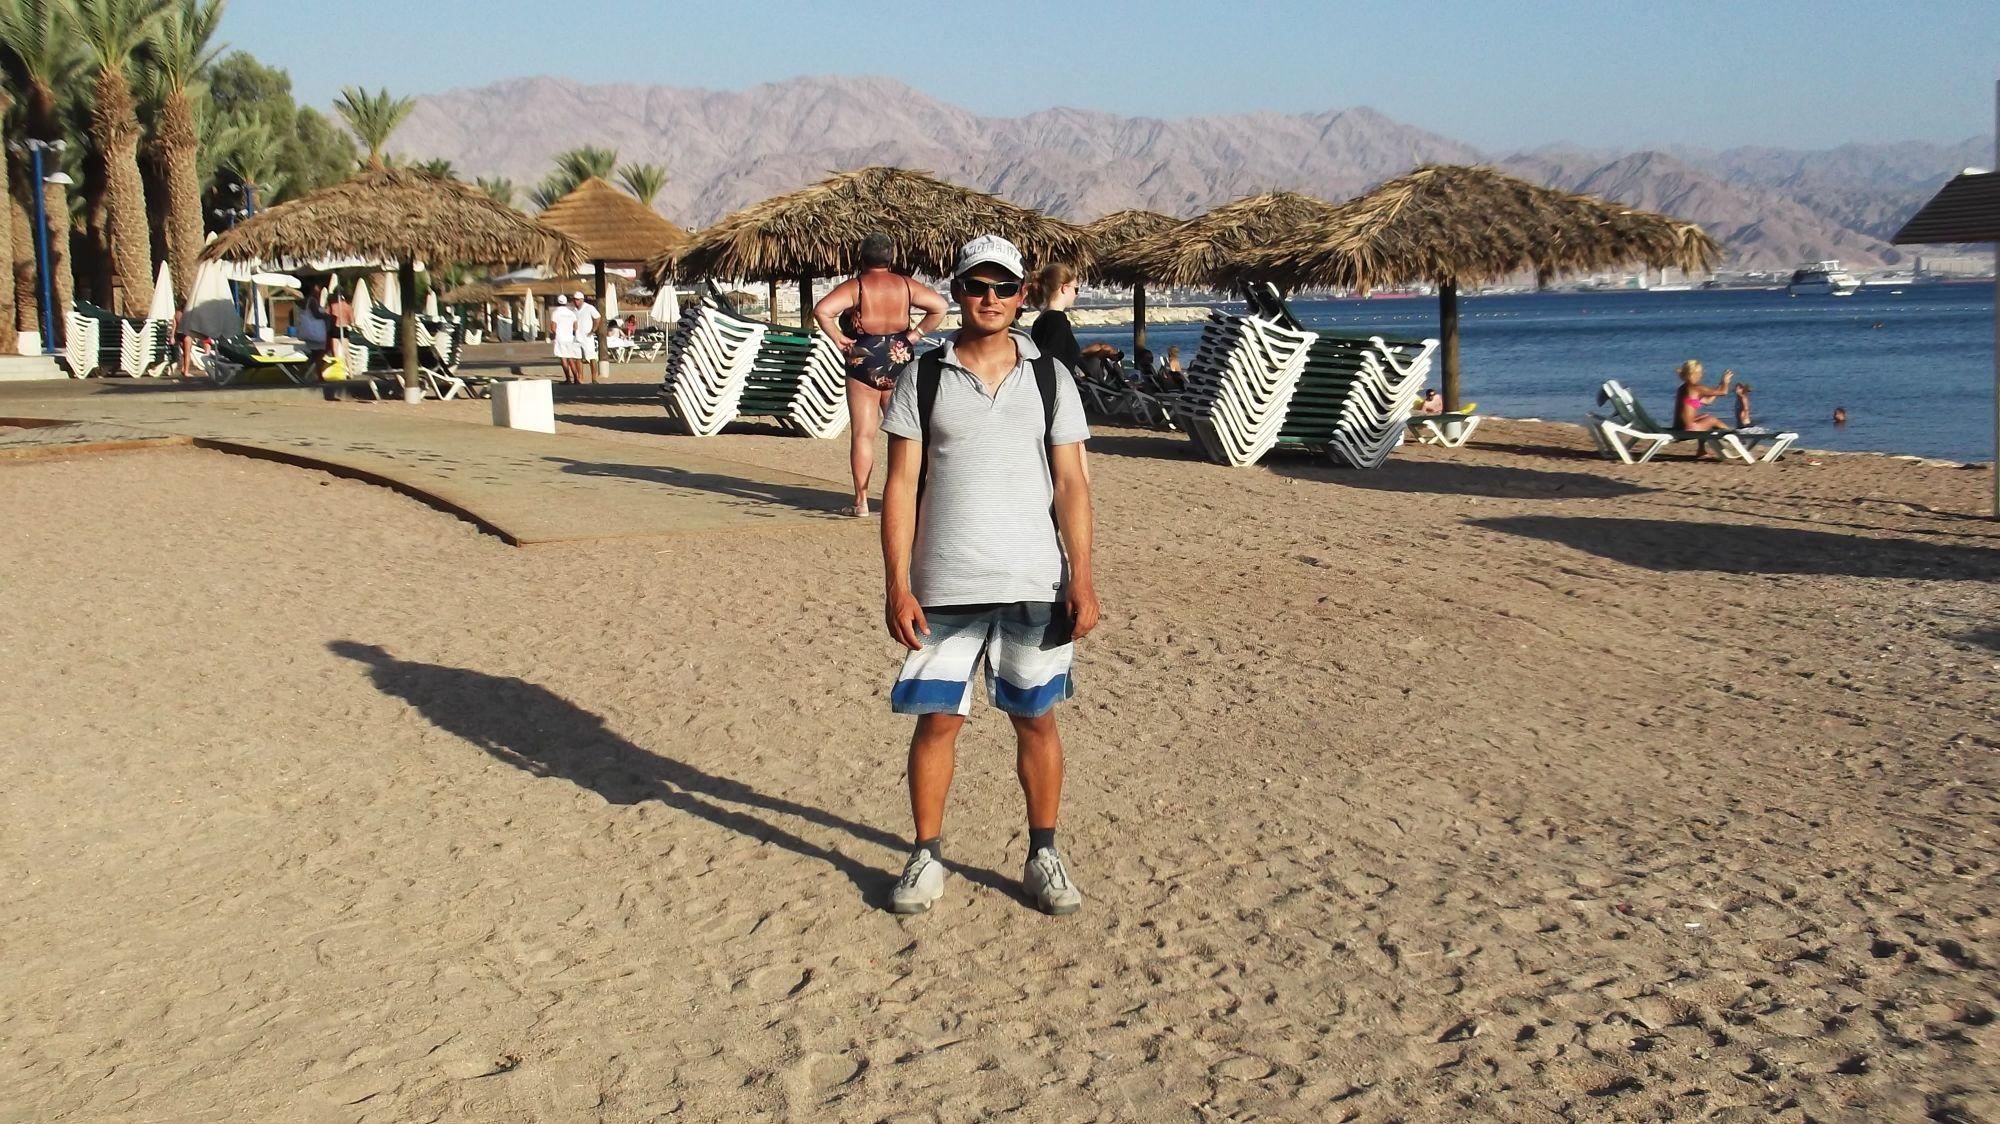 Izrael - Eilat - zdjęcia, atrakcje